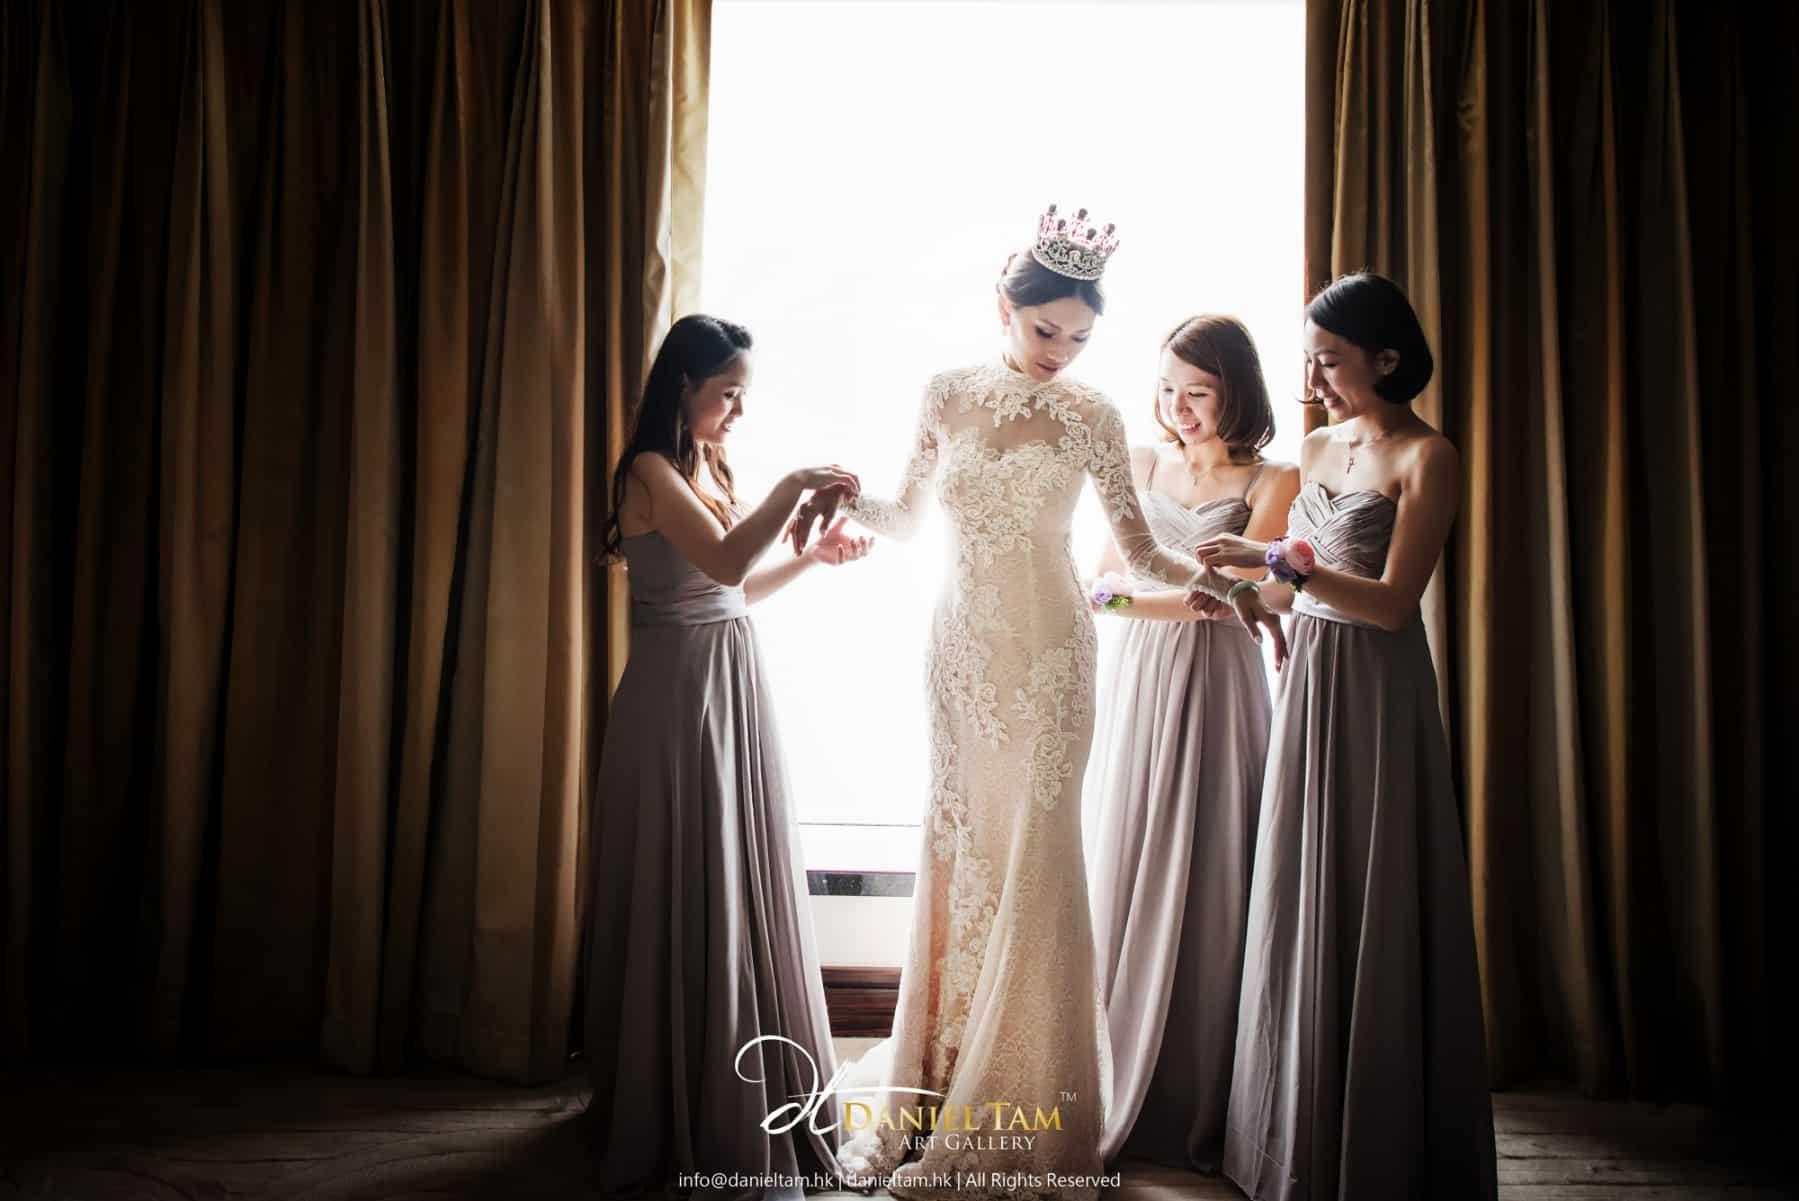 Wedding Day photography, Four Season Hotel